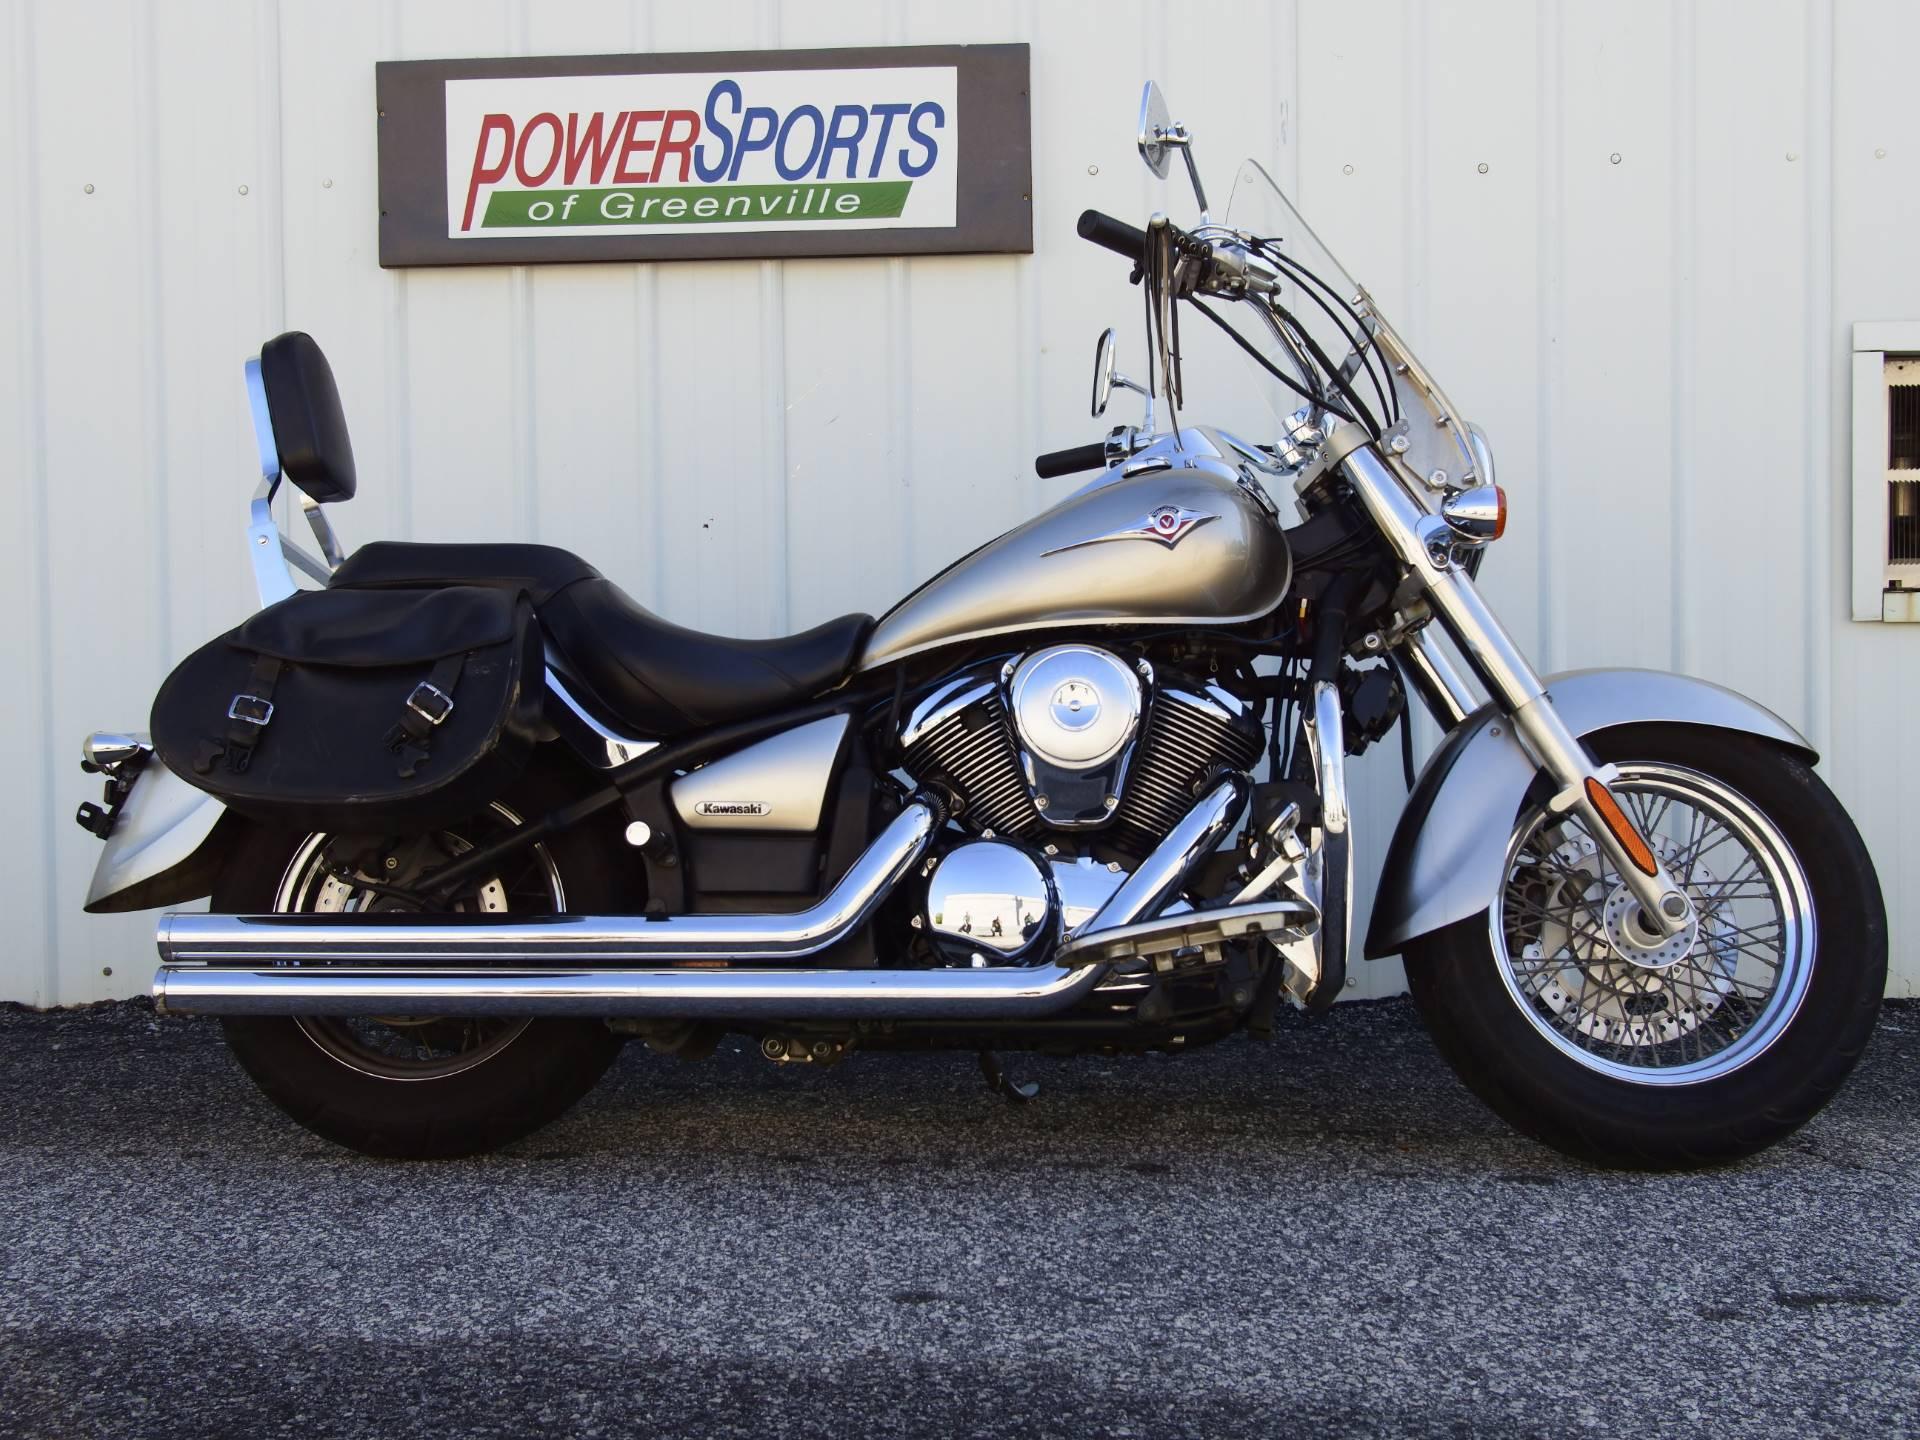 Used 2007 Kawasaki Vulcan® 900 Classic Motorcycles in Greenville, SC